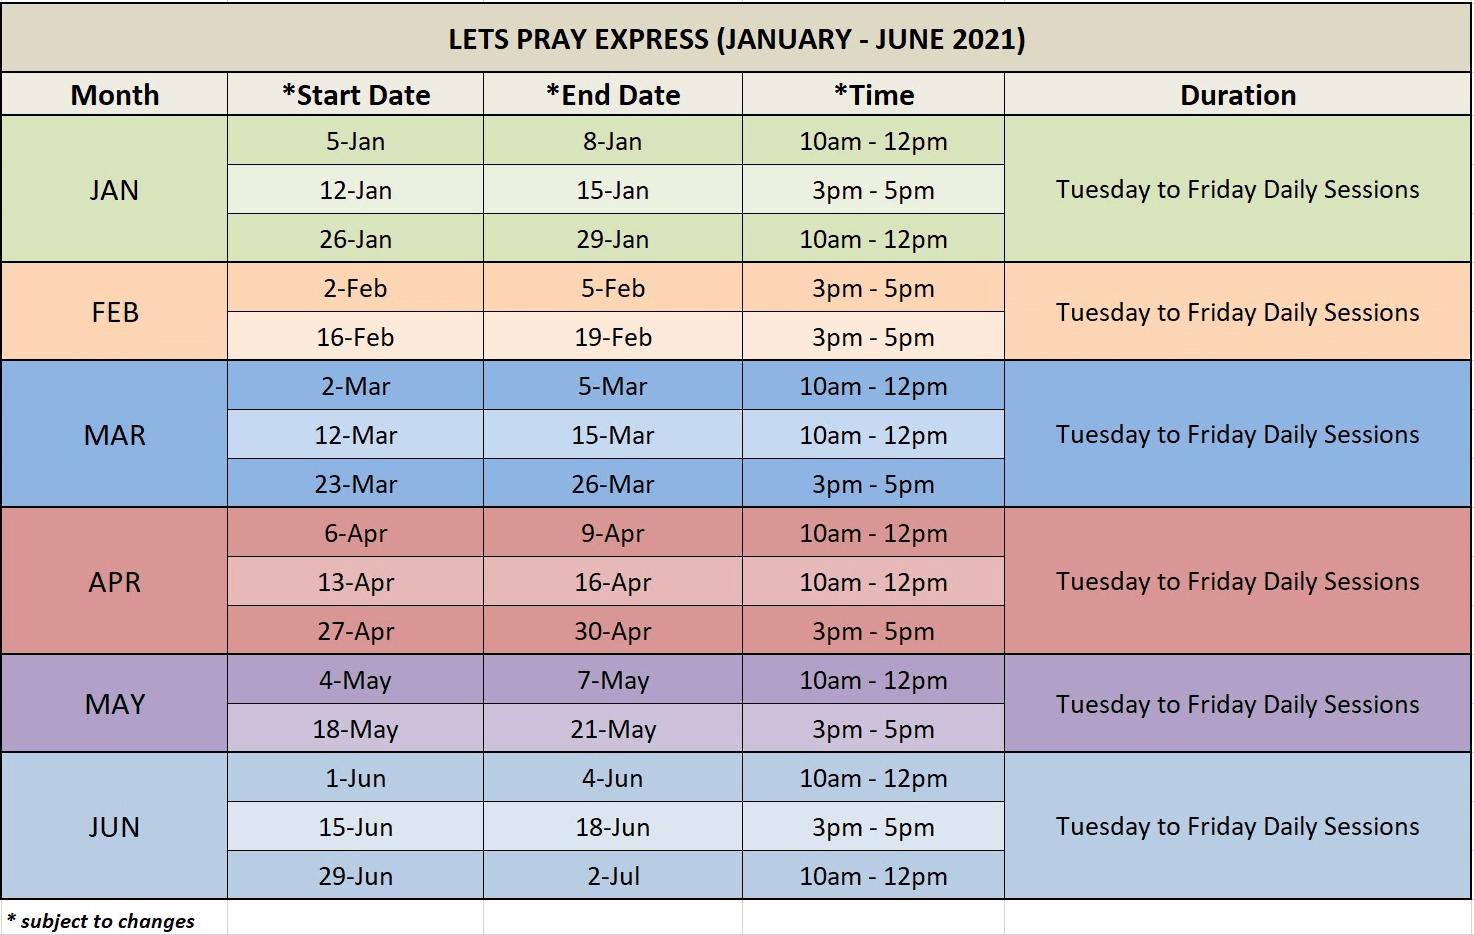 LPX Jan - June